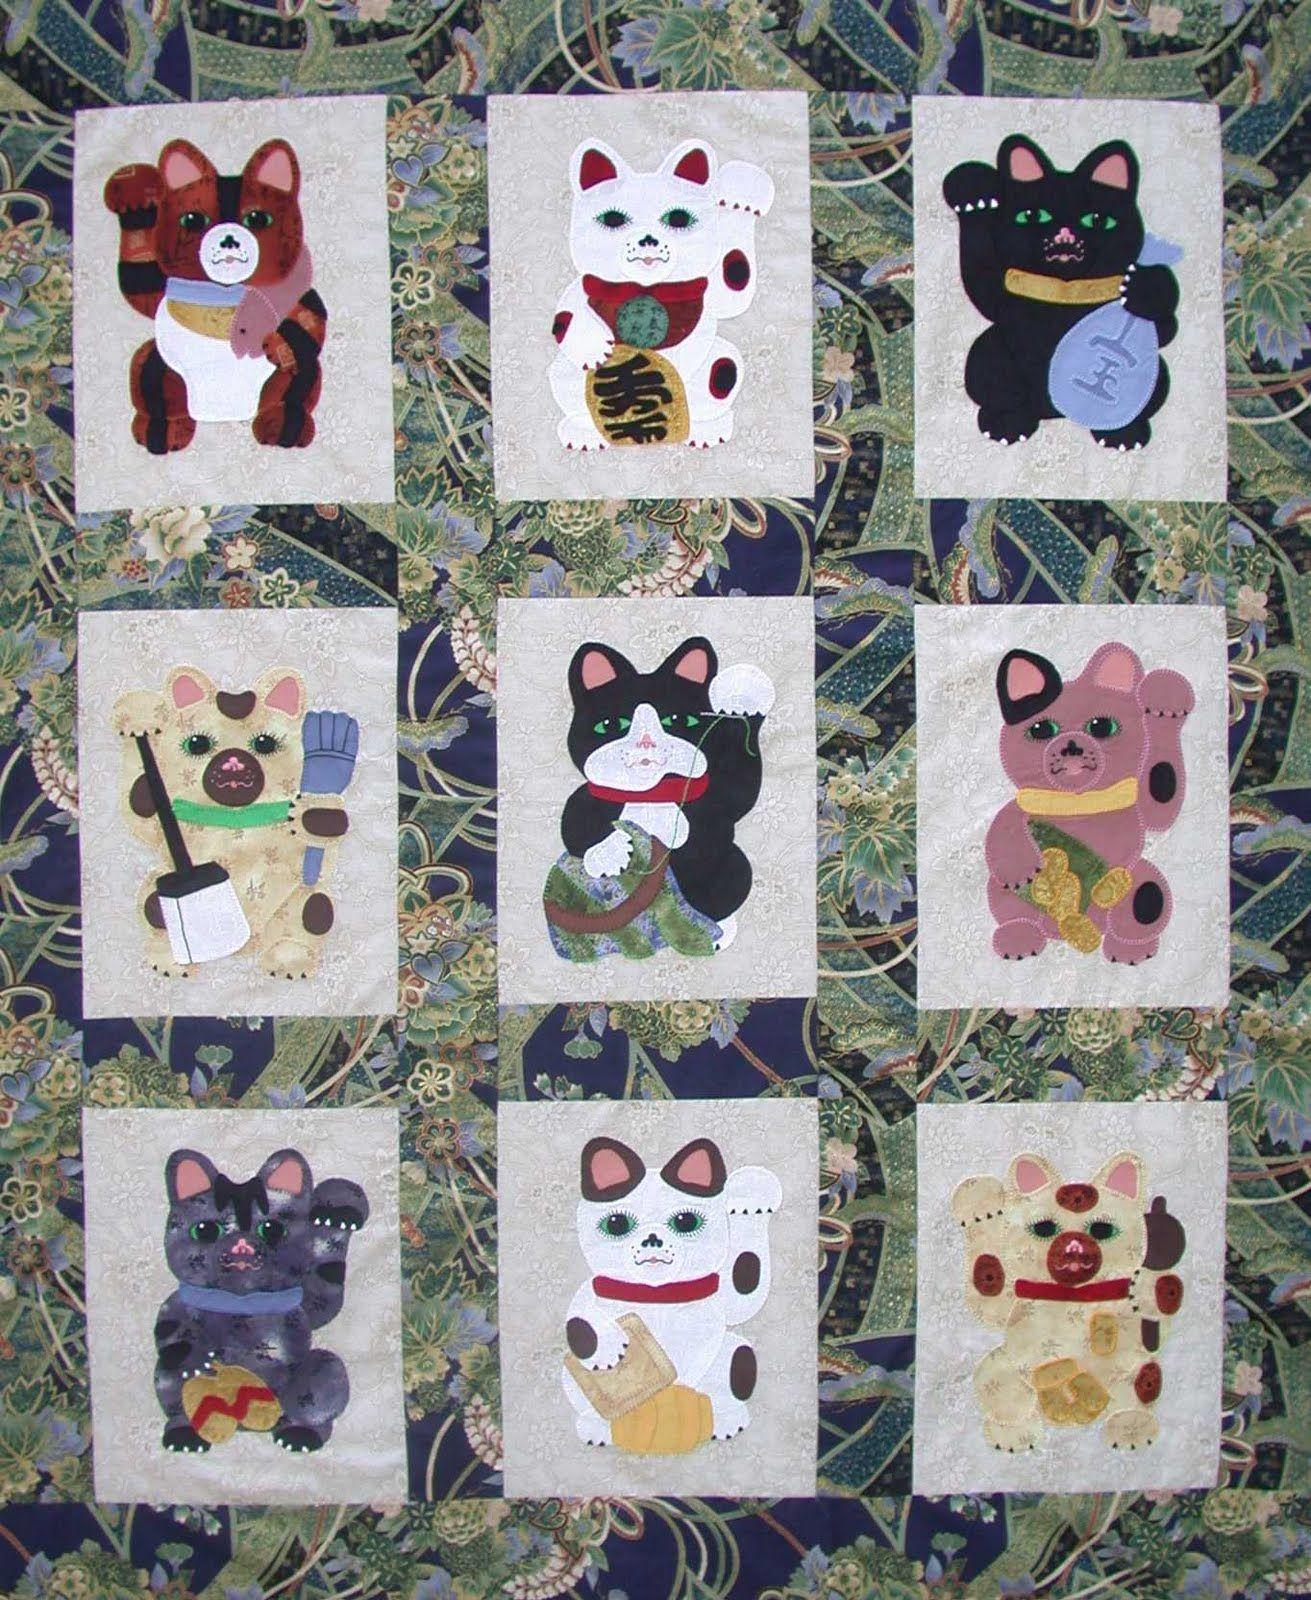 Maneki Neko (beckoning cat) applique quilt pattern by Su-Sun ... : applique cat quilt patterns - Adamdwight.com